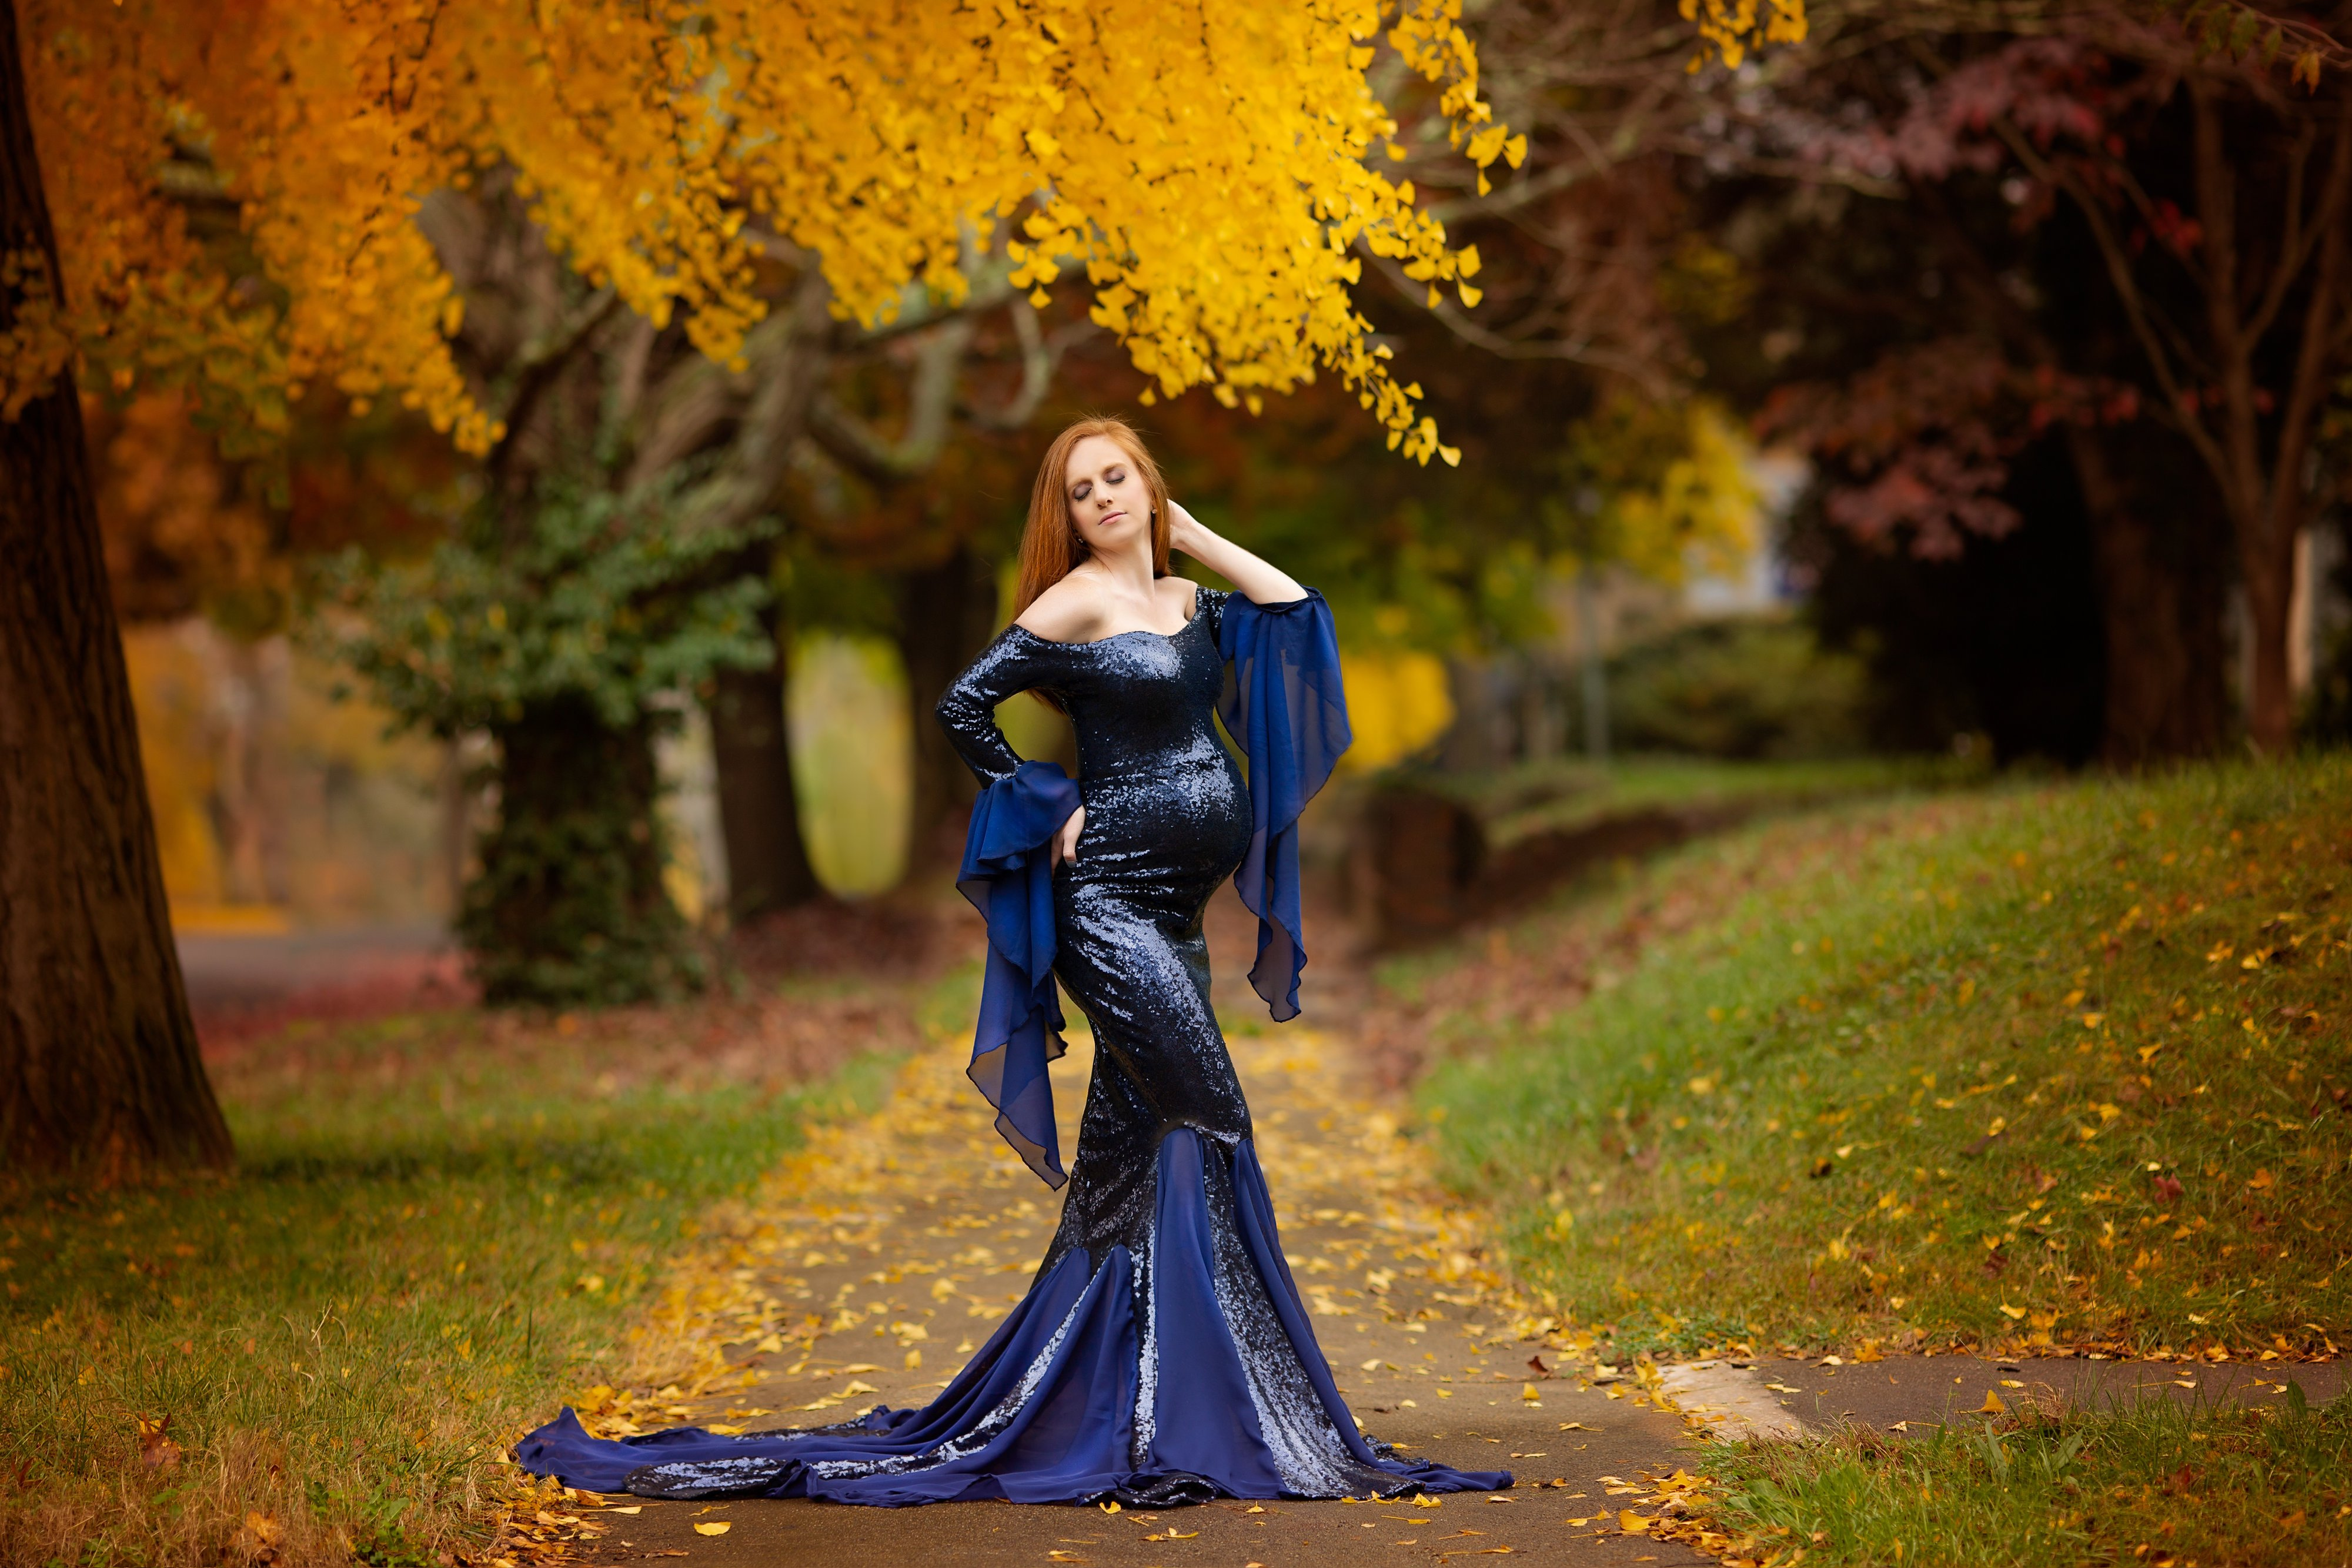 Gwendolyn sequin formal gown